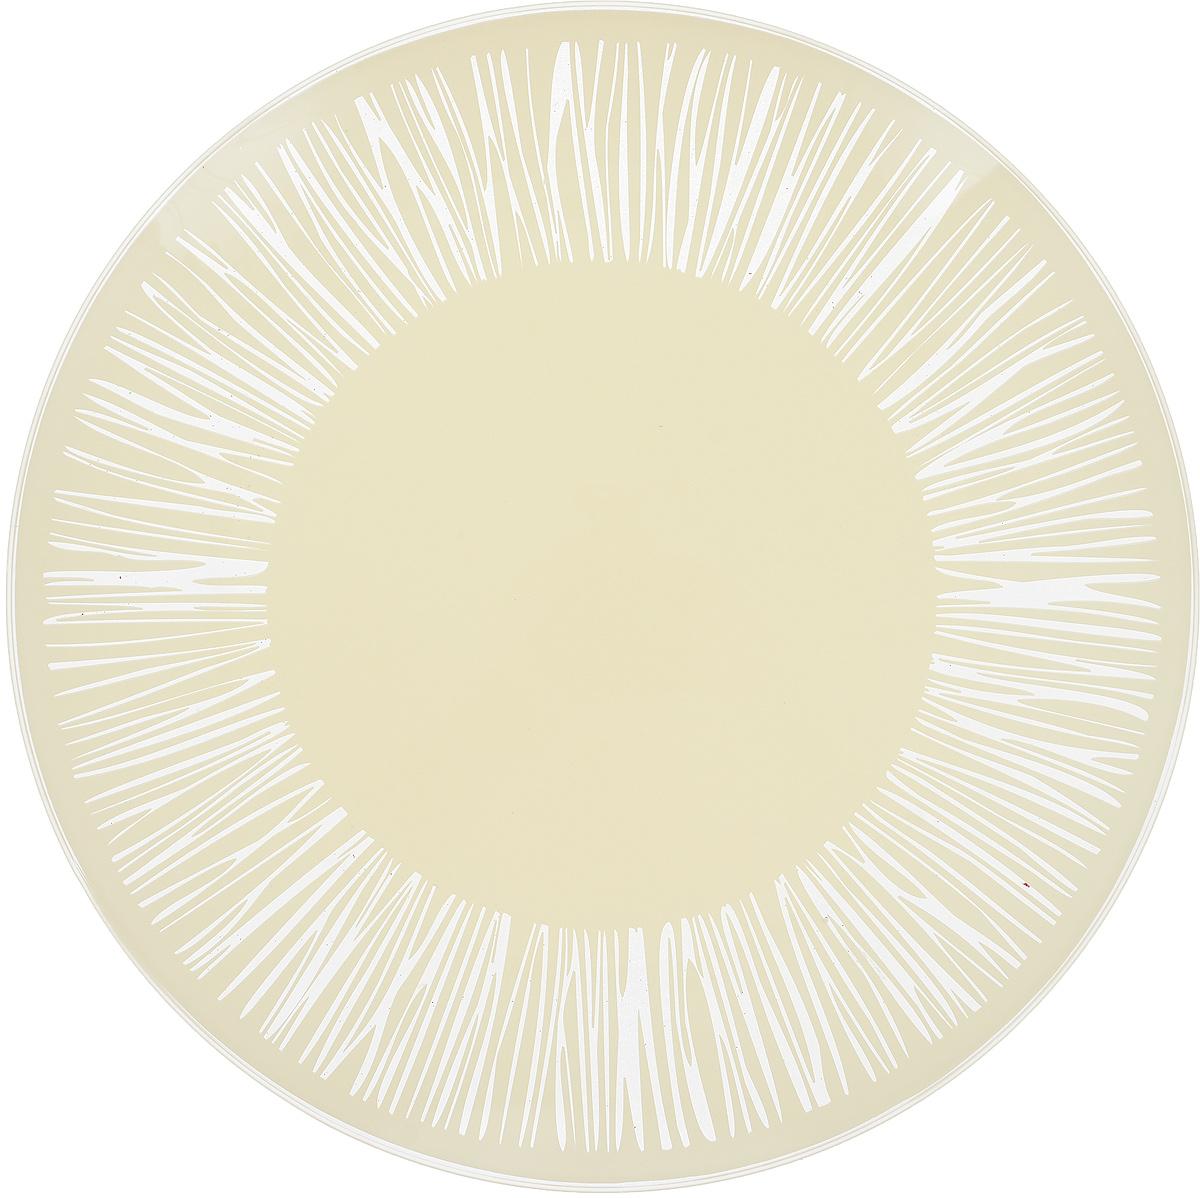 Тарелка NiNaGlass Витас, цвет: белый, диаметр 26 см ваза ninaglass дана цвет шоколад высота 16 см